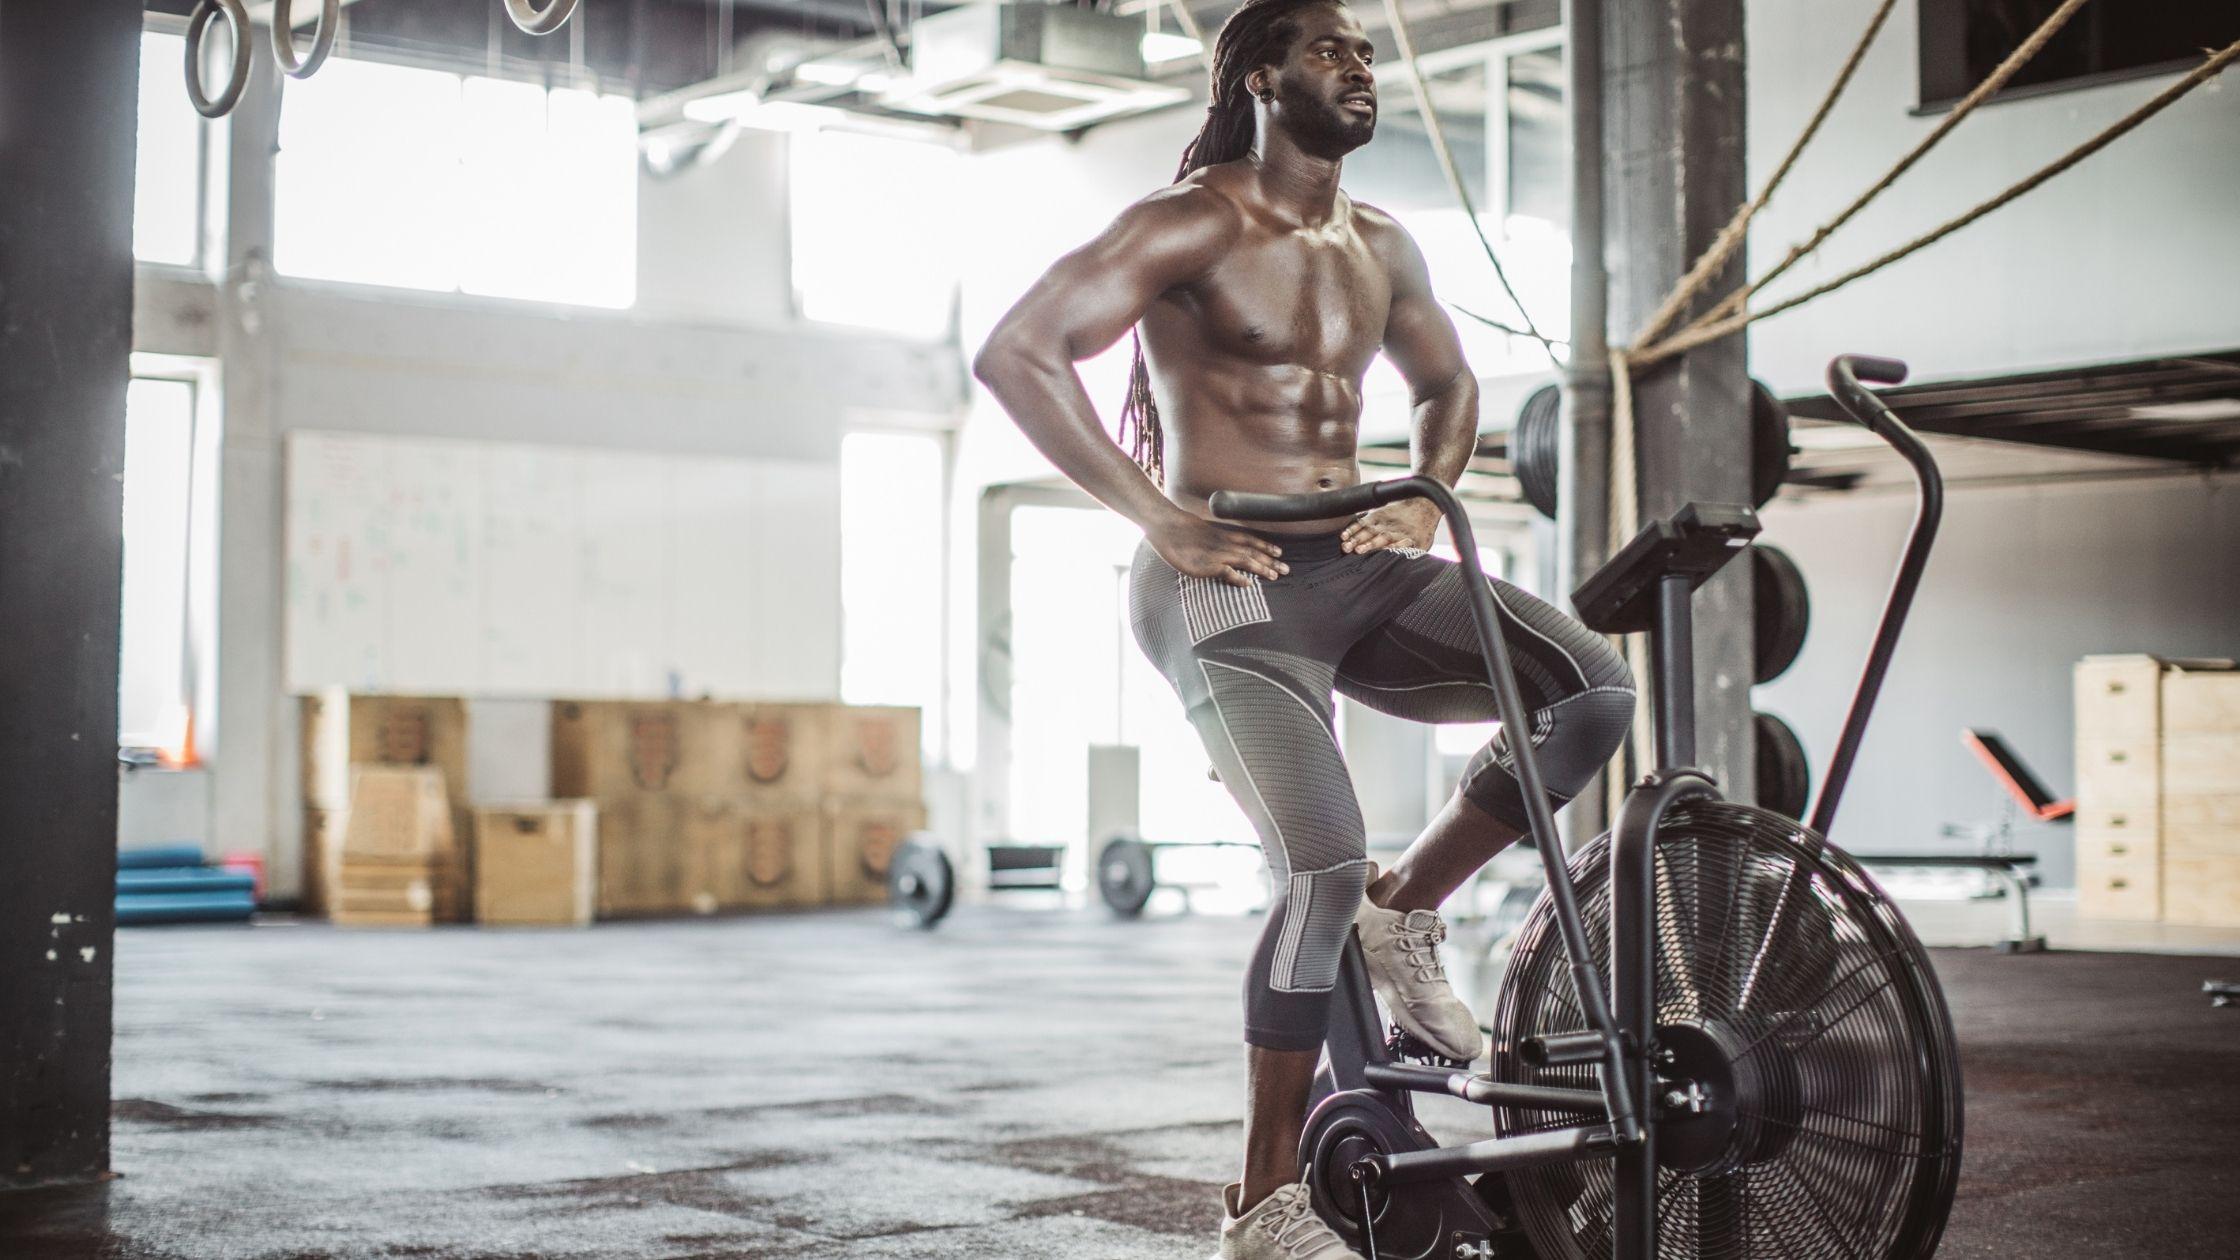 types of exercise bikes: Upright Exercise Bikes